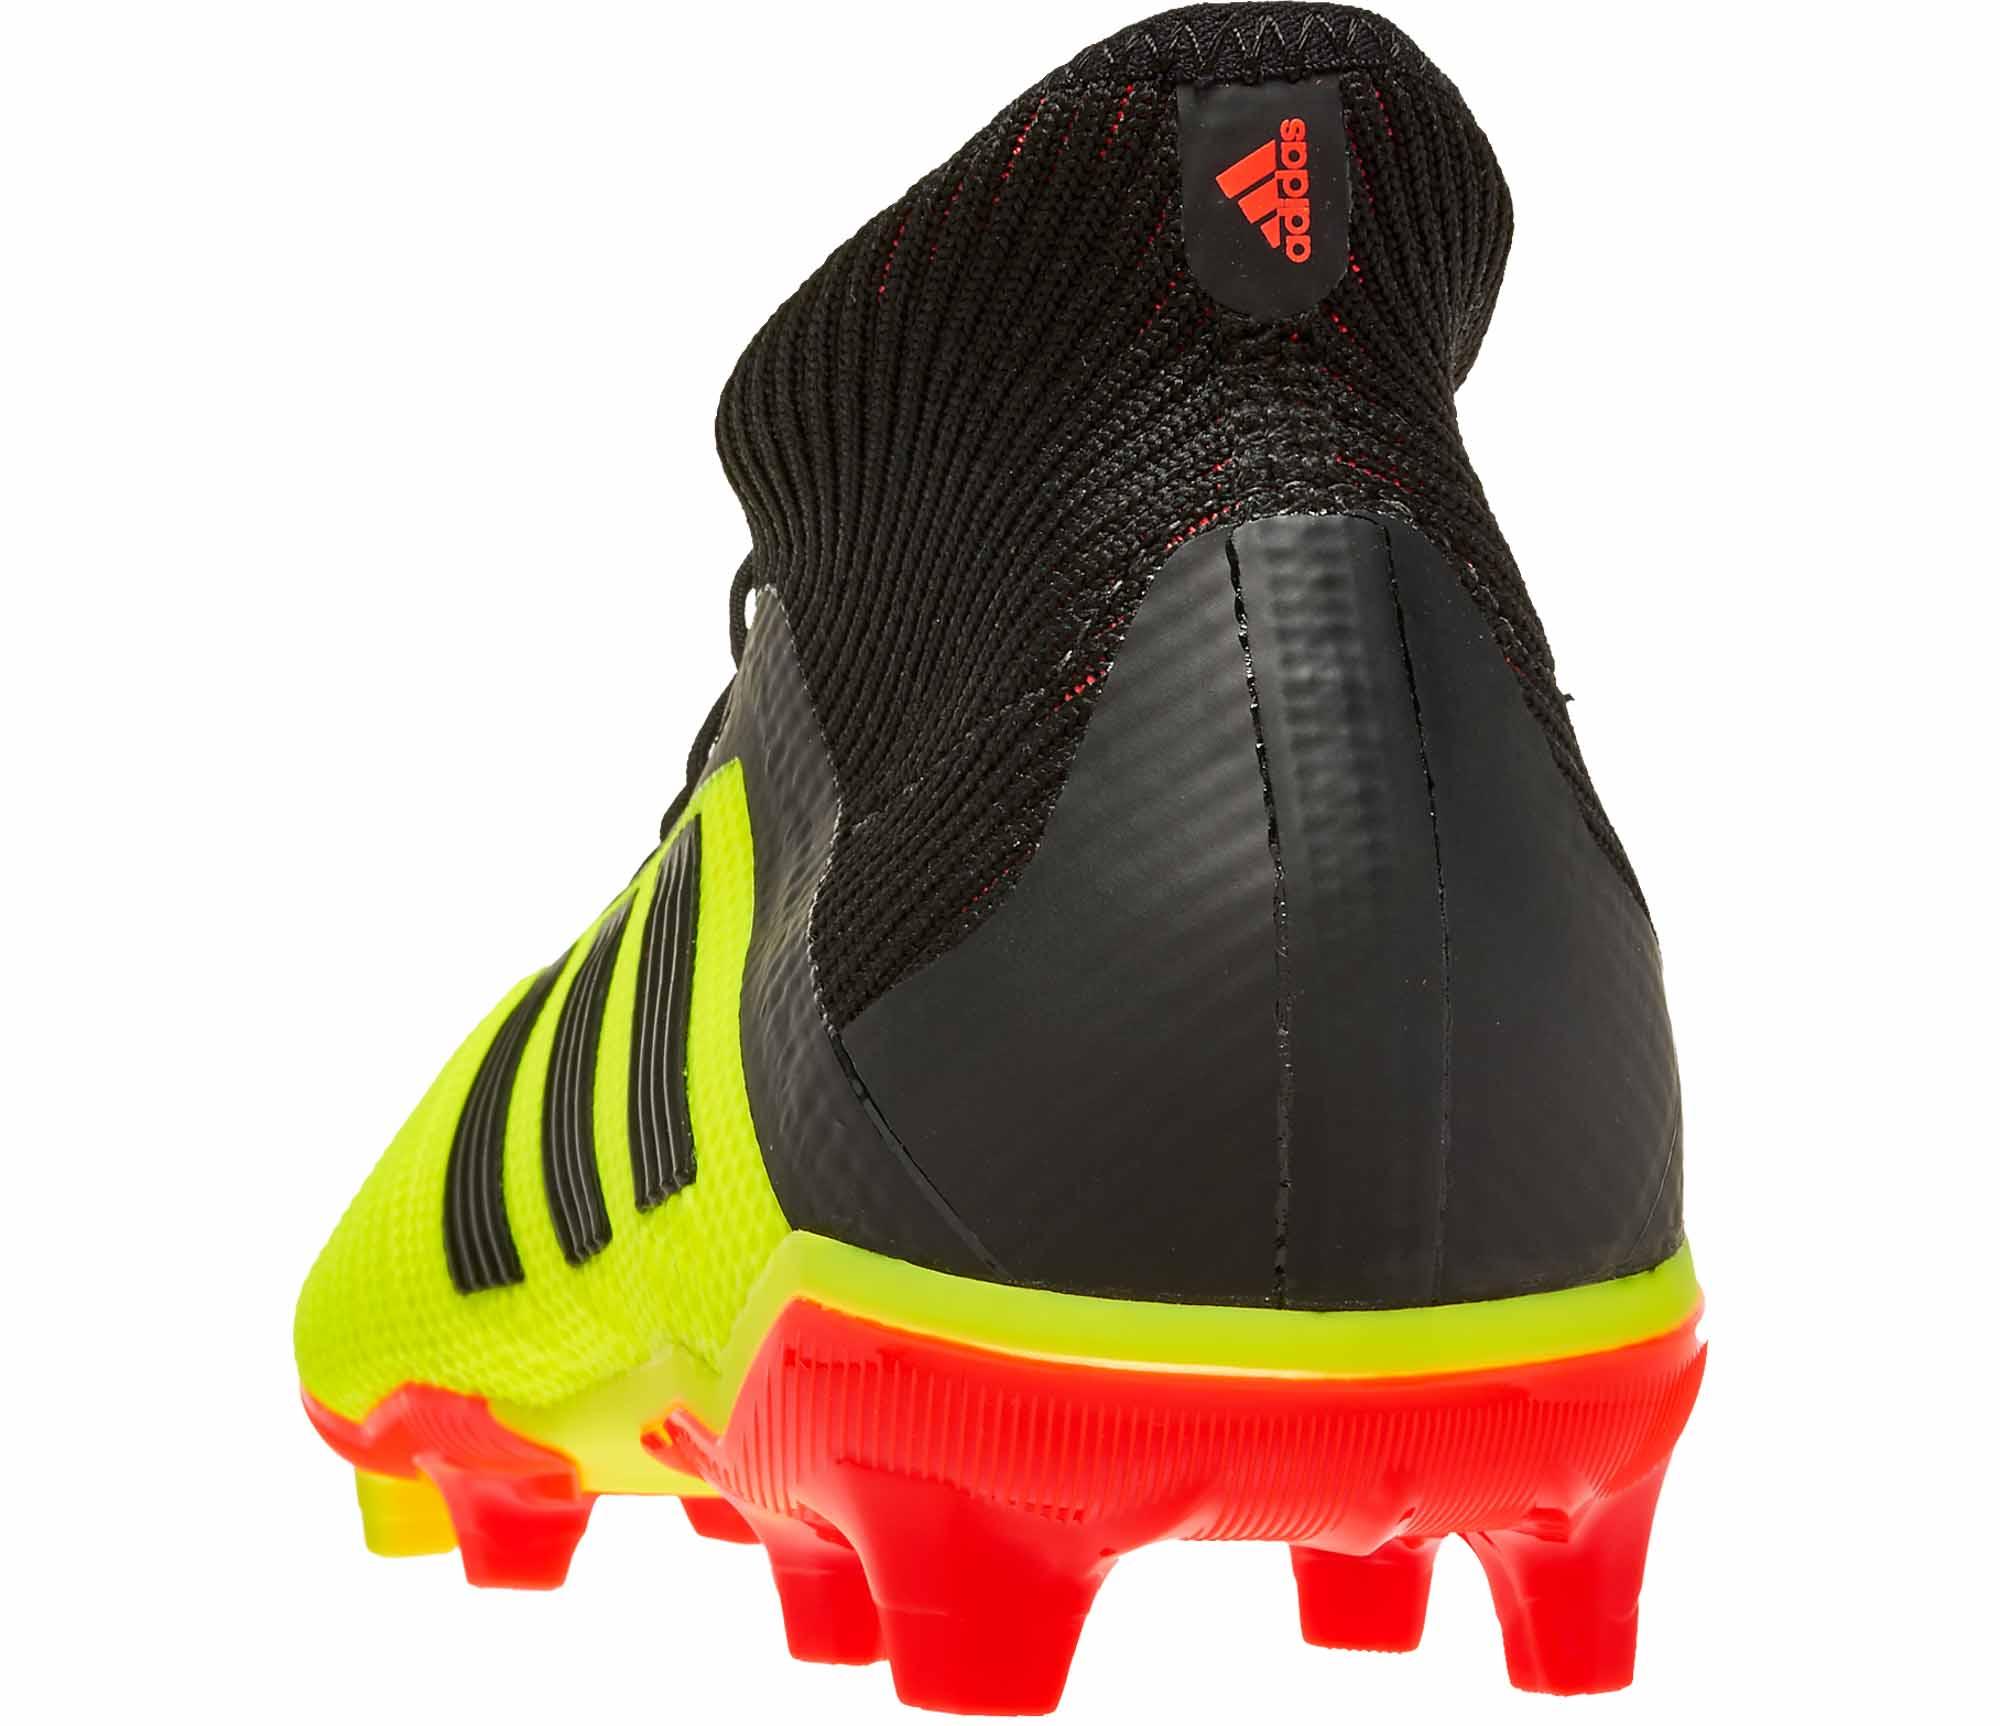 55a4f5c2b Kids adidas Predator 18.1 FG - Solar Yellow/Black/Solar Red - Soccer ...